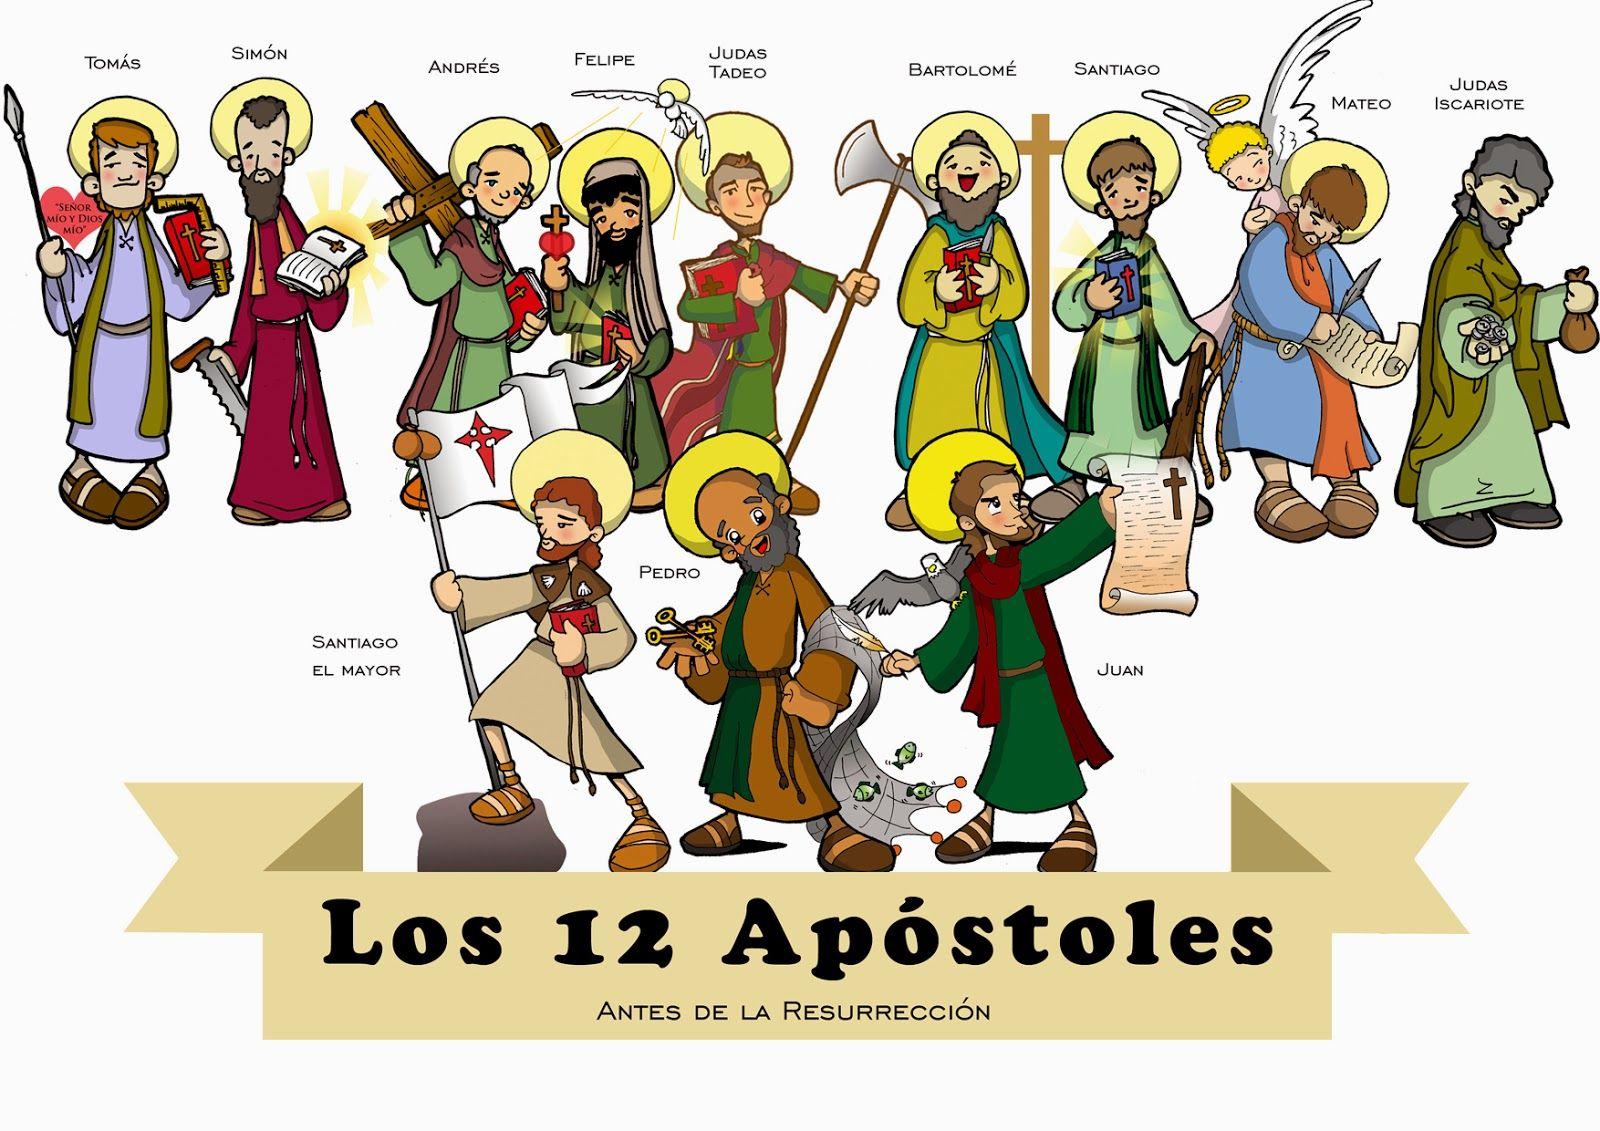 Los Doce Apostoles Catequesis Apostoles De Jesus Apostoles